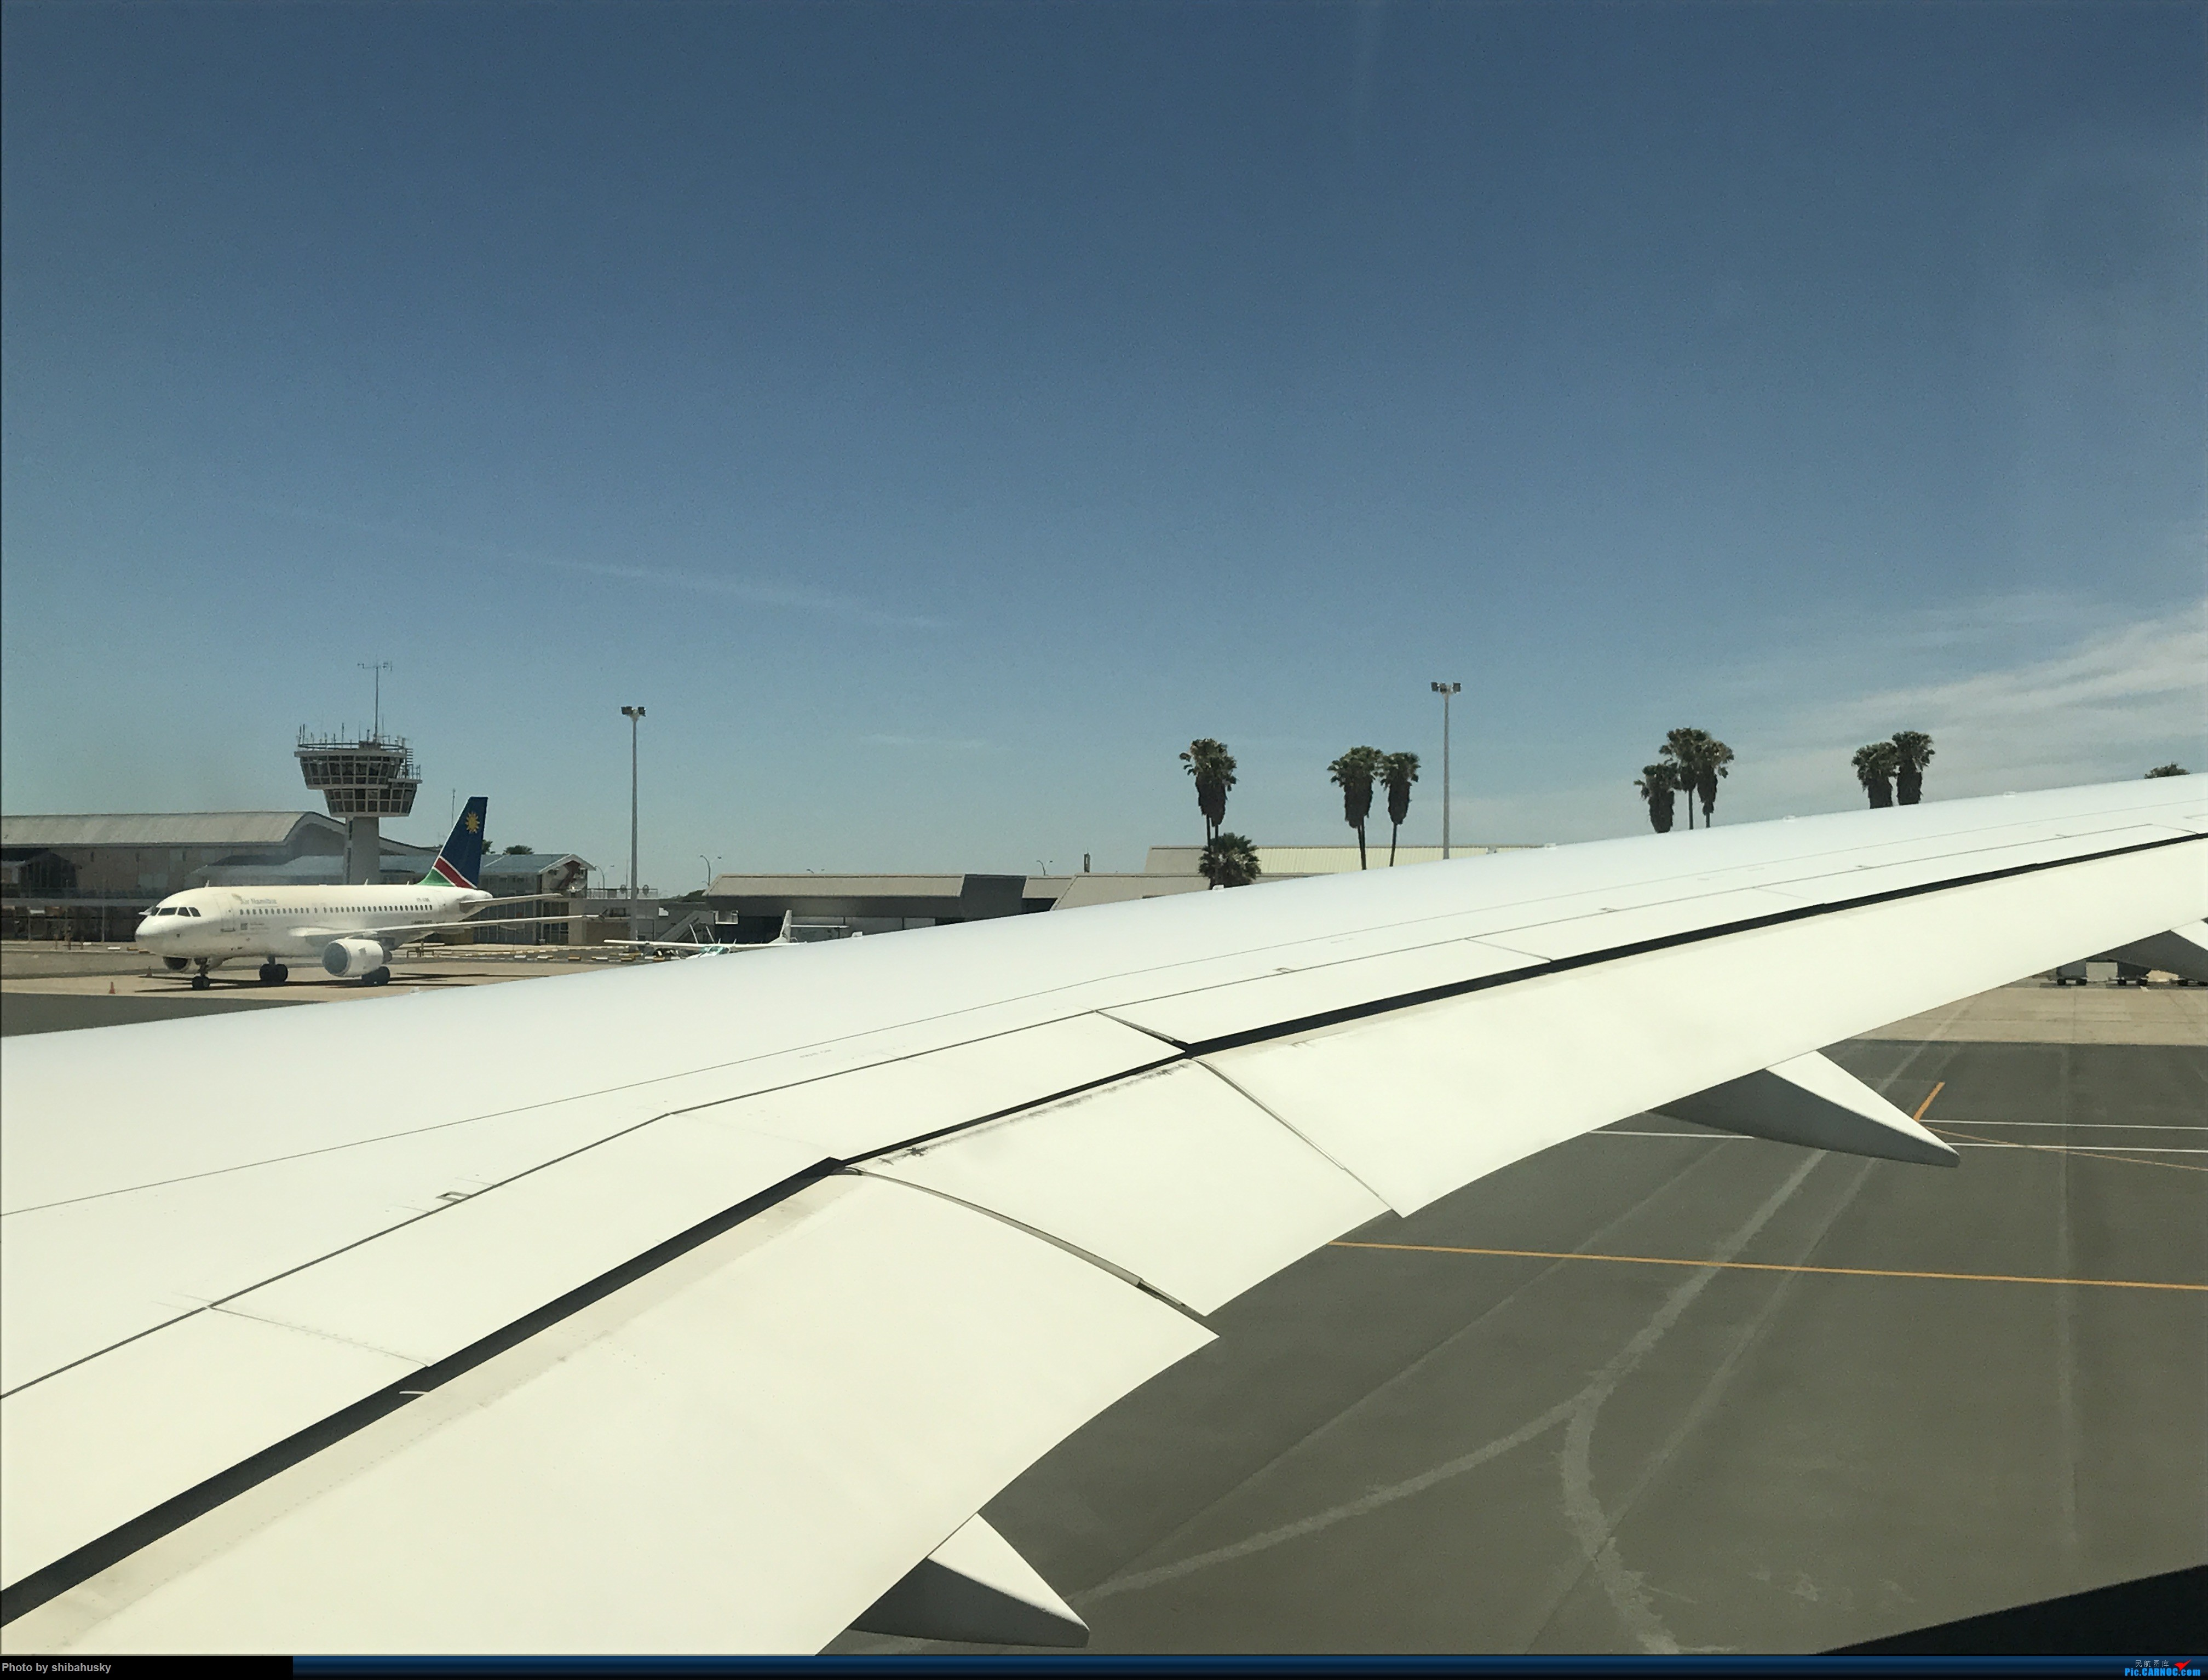 Re:新人第一帖 WVB-WDH-DOH-CDG-SOU 圣诞纳米比亚游记 体验稀有机型加辗转回英 BOEING 787-8 A7-BDD 温得和克国际机场